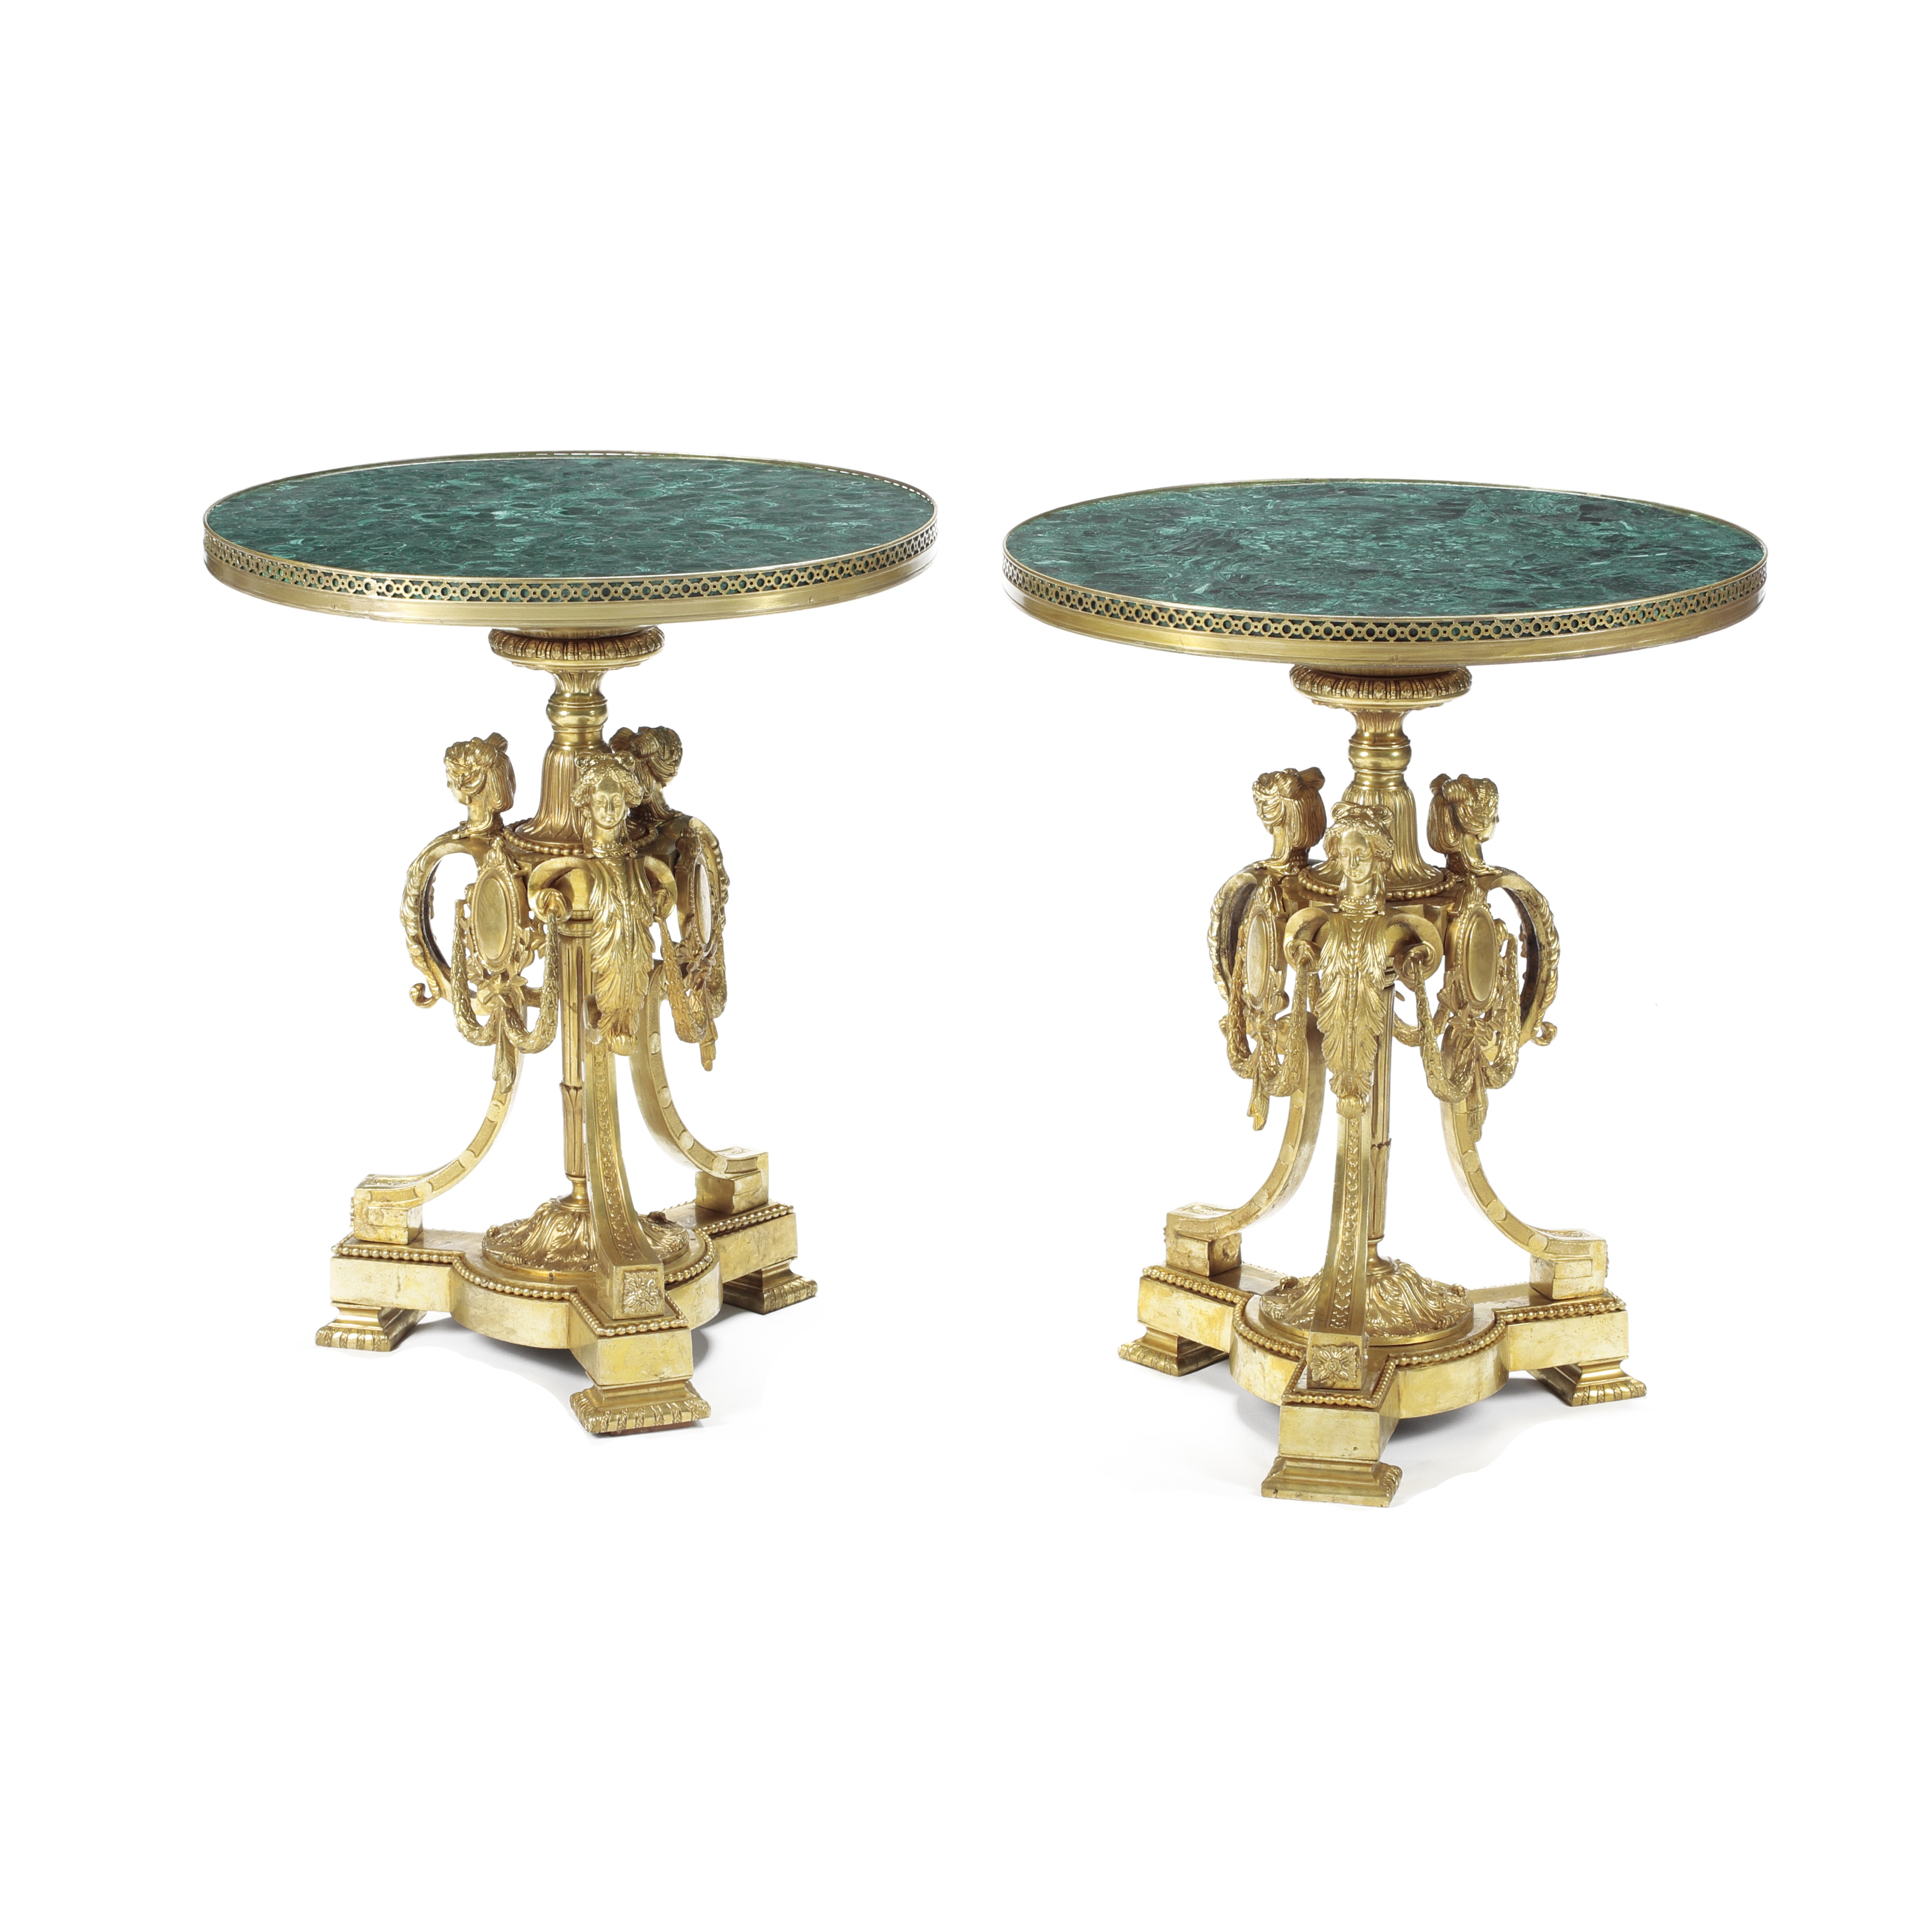 Lot 288 - A Pair of Louis XIV Malachite Top Gilt Bronze Gueridons